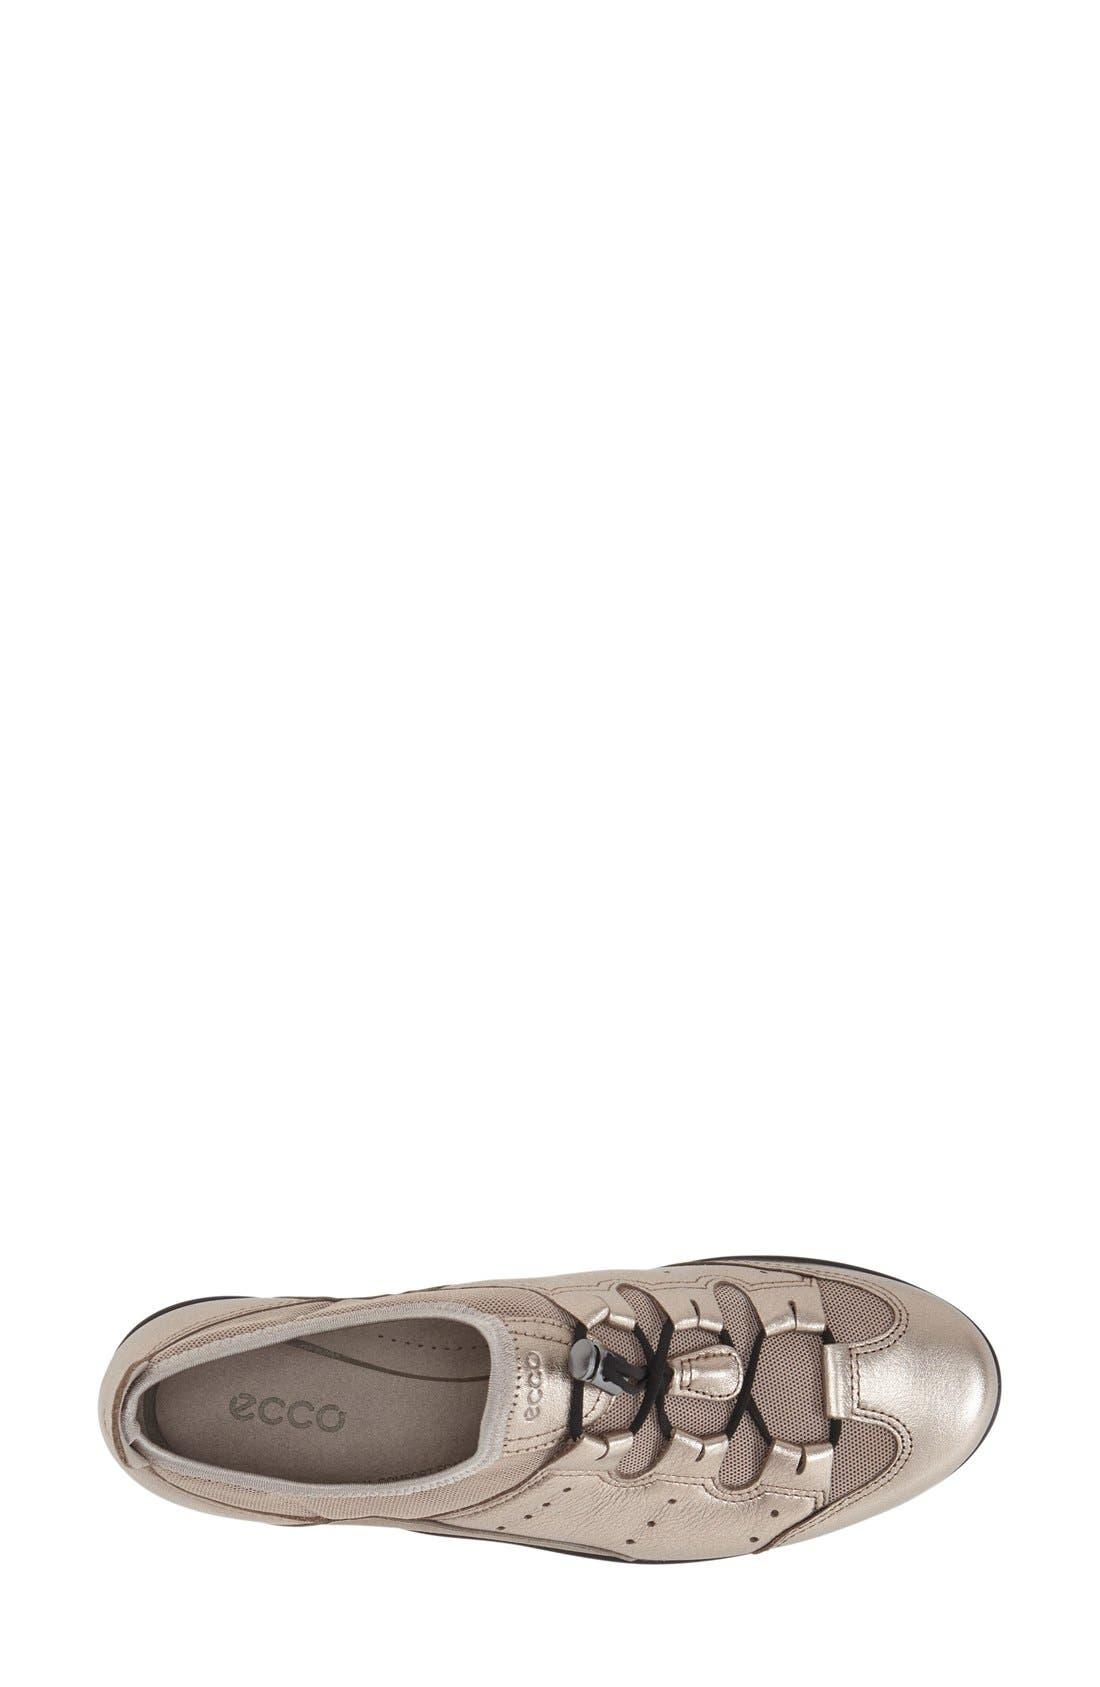 'Bluma' Sneaker,                             Alternate thumbnail 3, color,                             Grey Leather Fabric